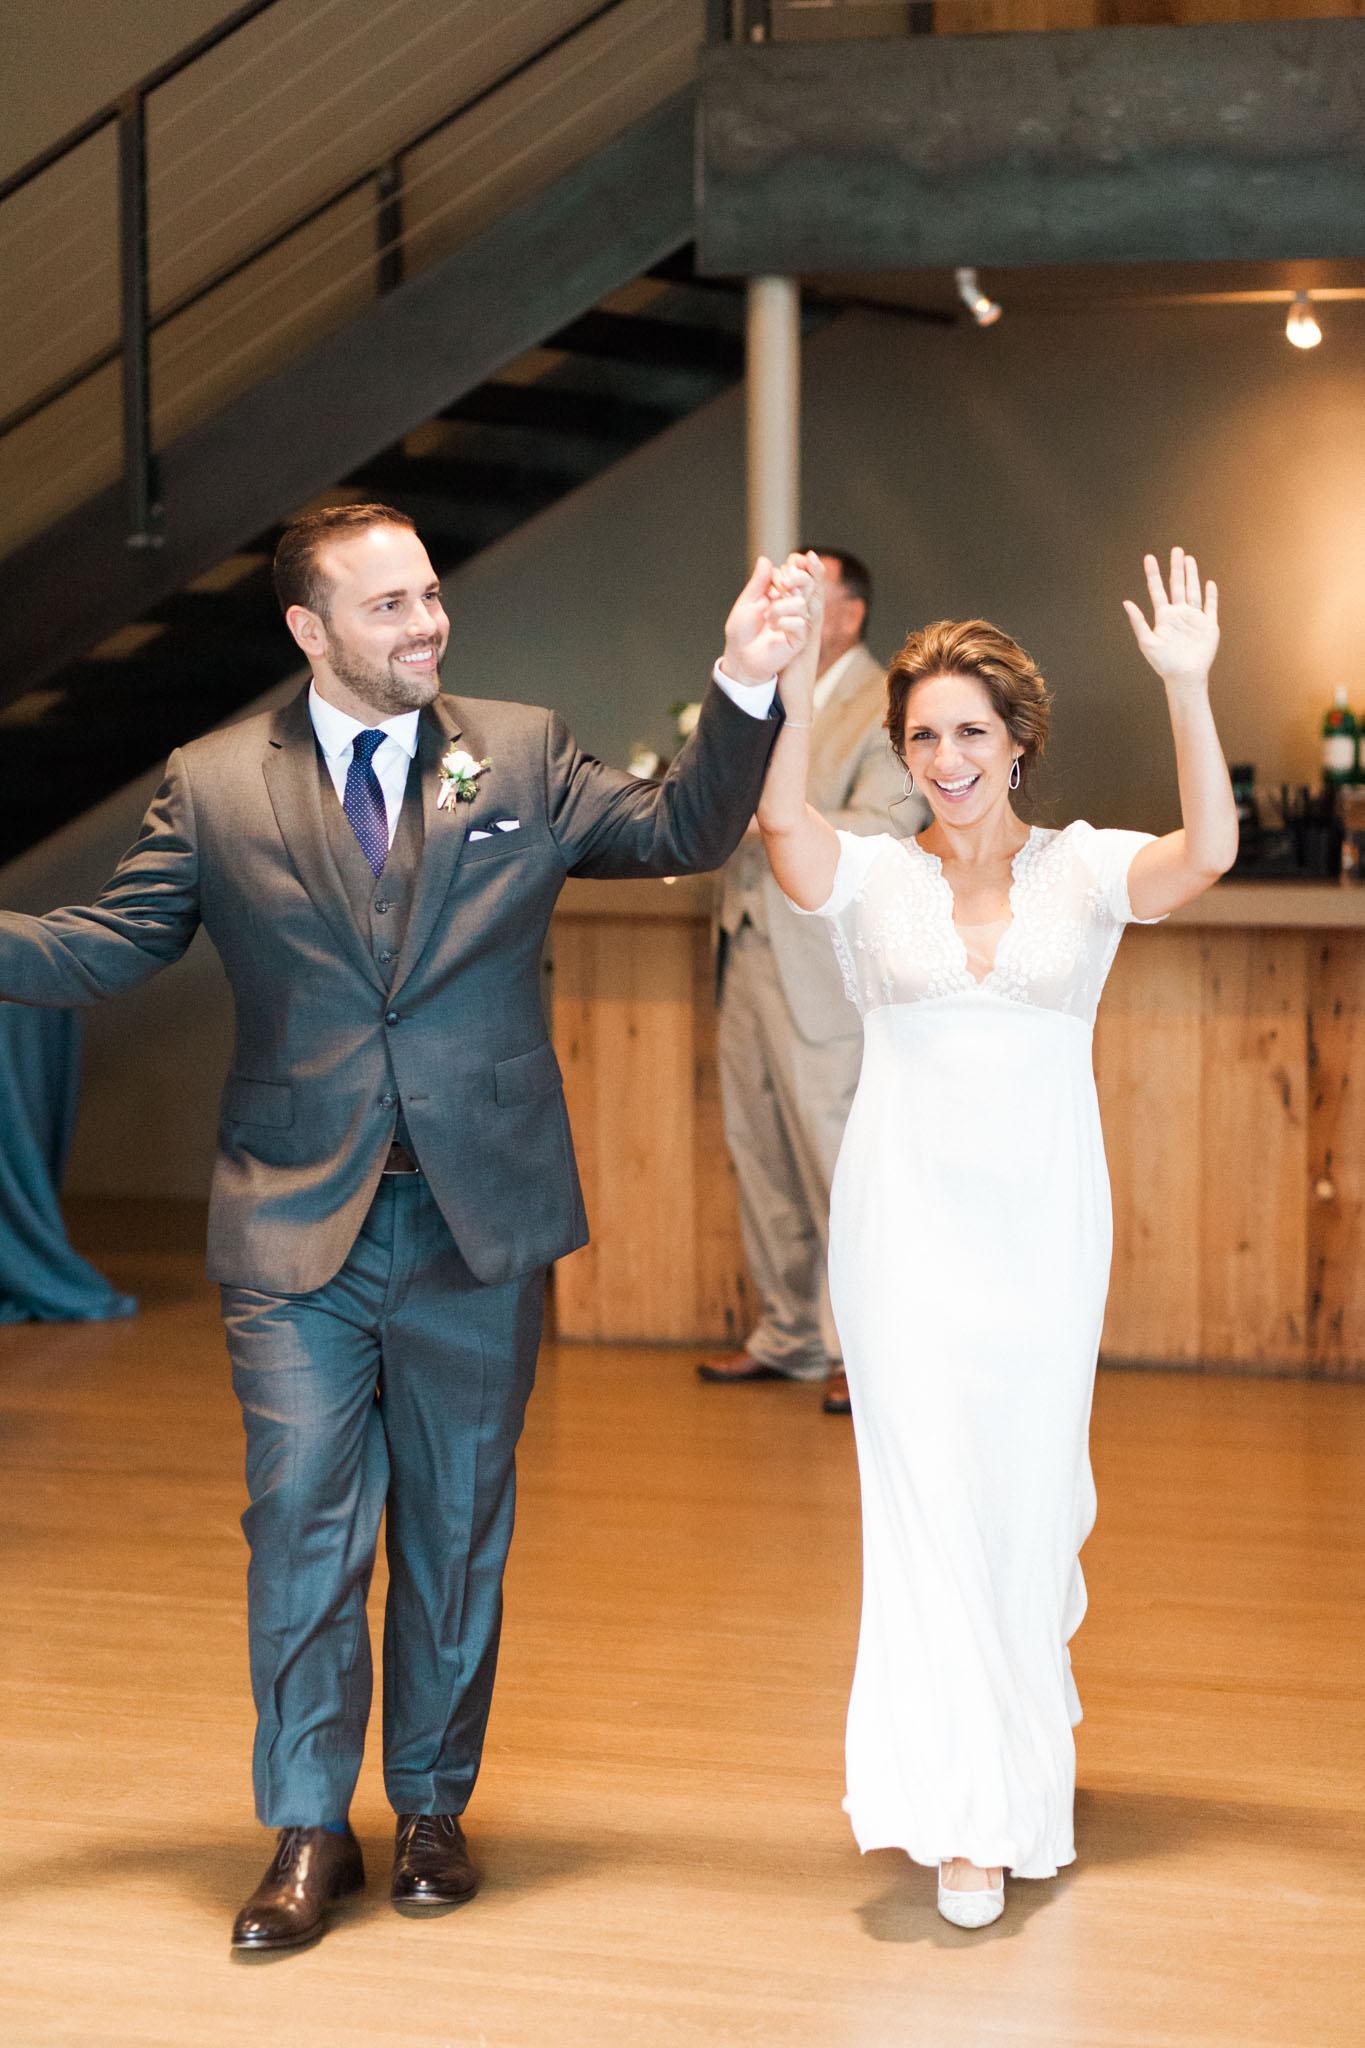 HiloandGinger-Brian+Dina_Weddingday_SneakPeek-48.jpg